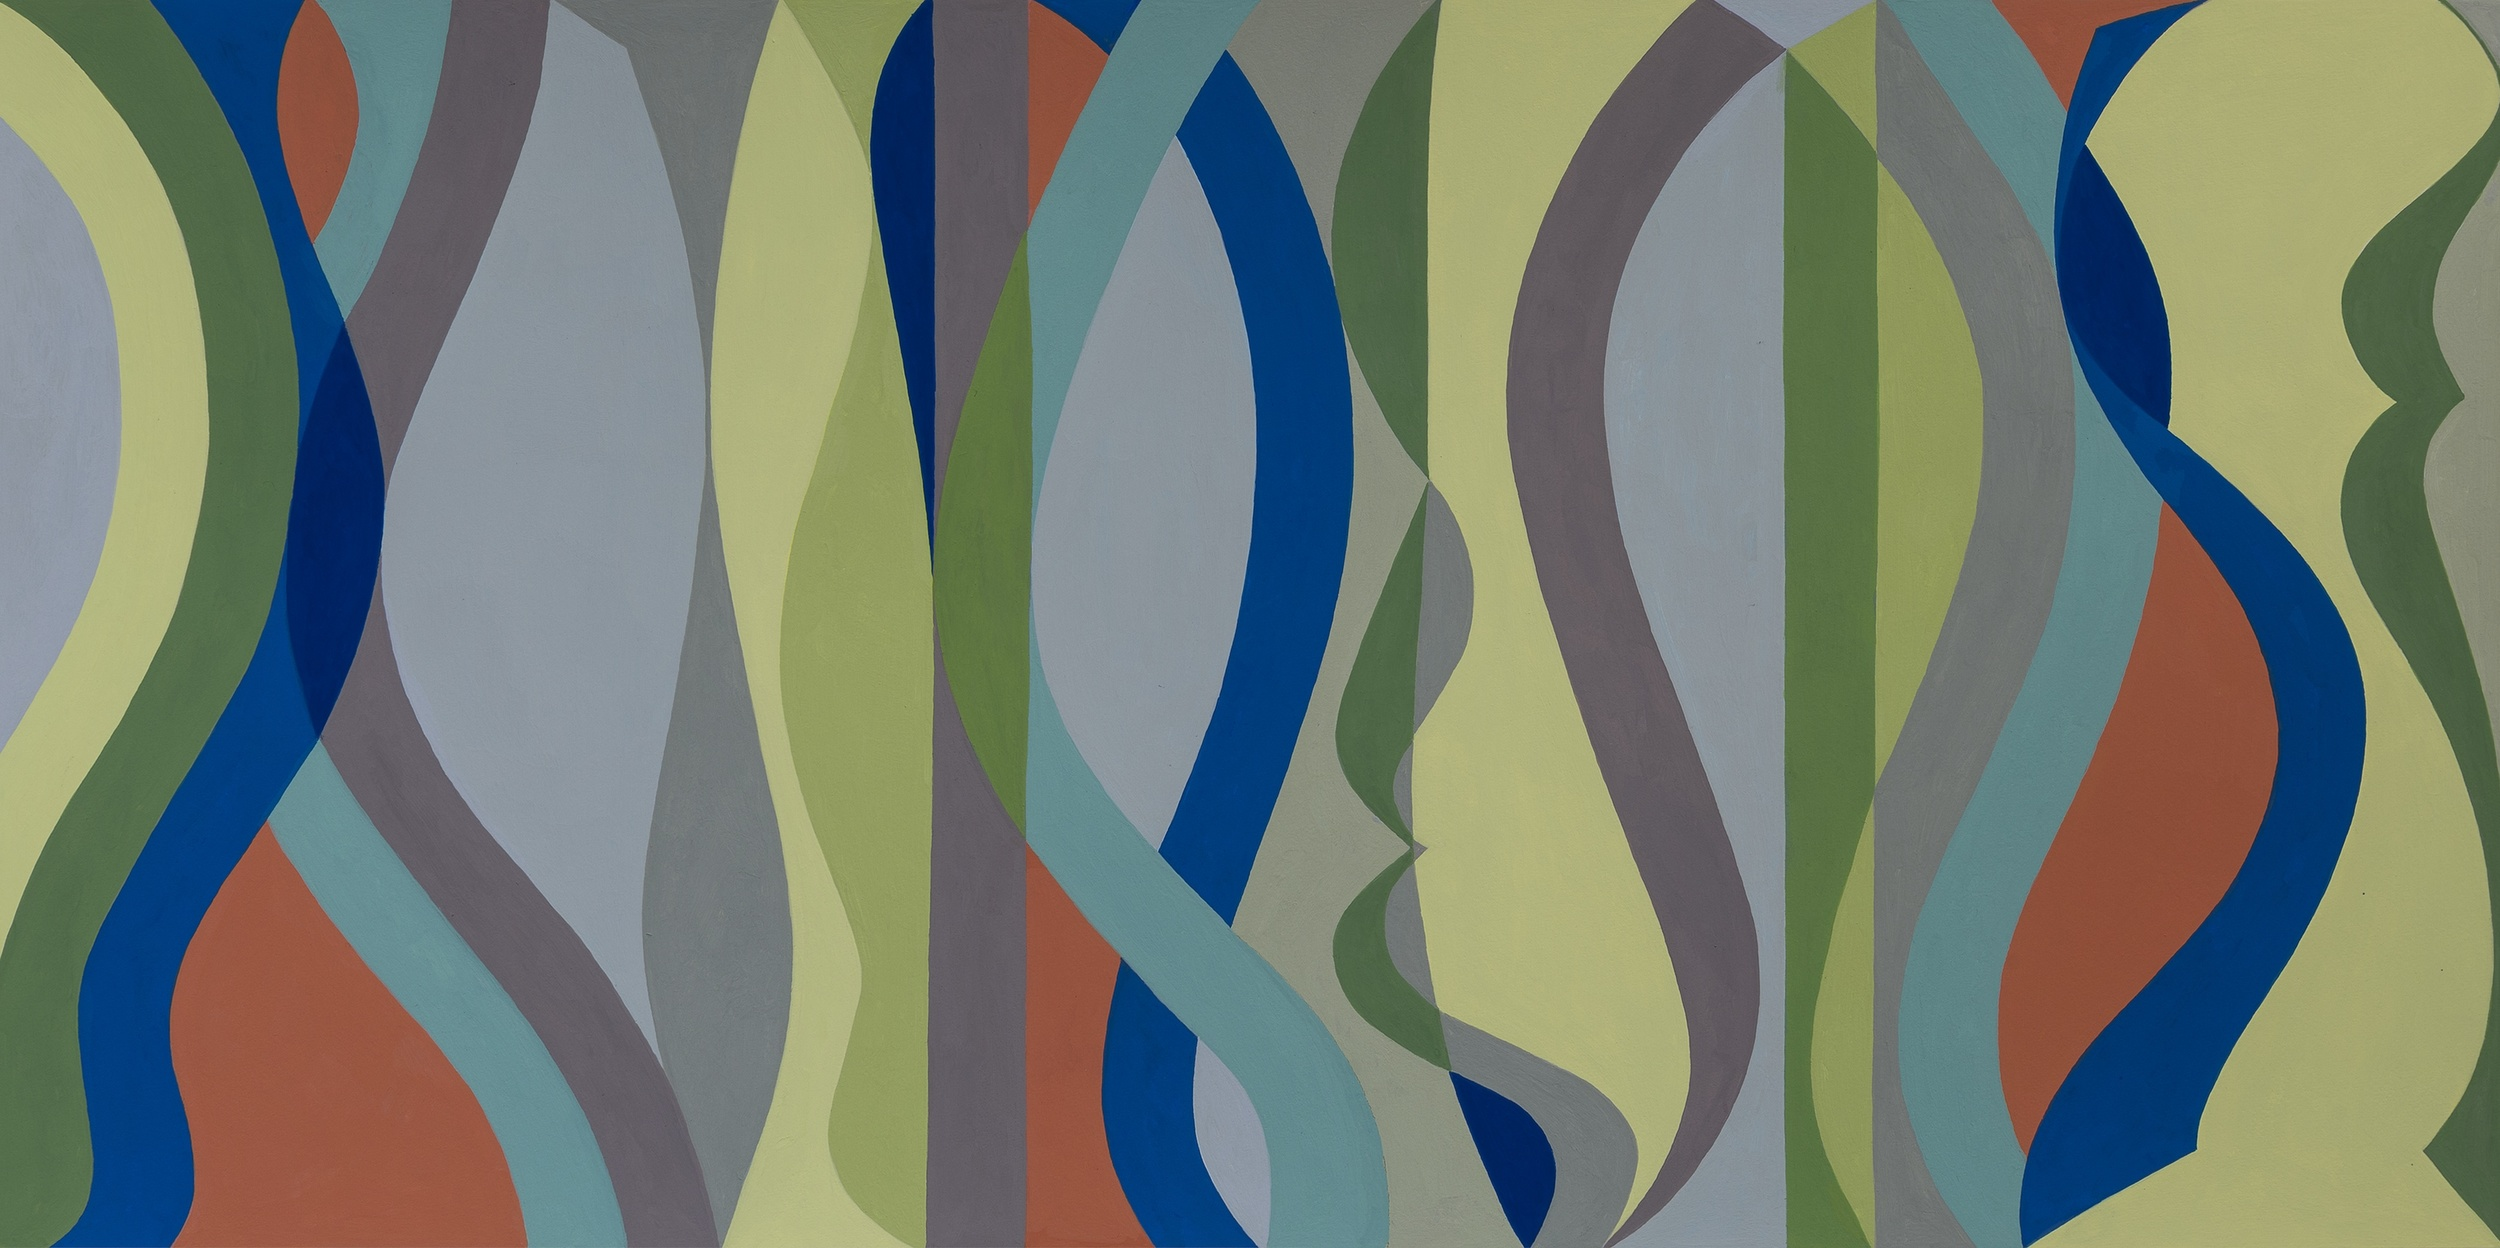 Horizontal Sine Horizon #2, Gouche on Paper, 20 x 30